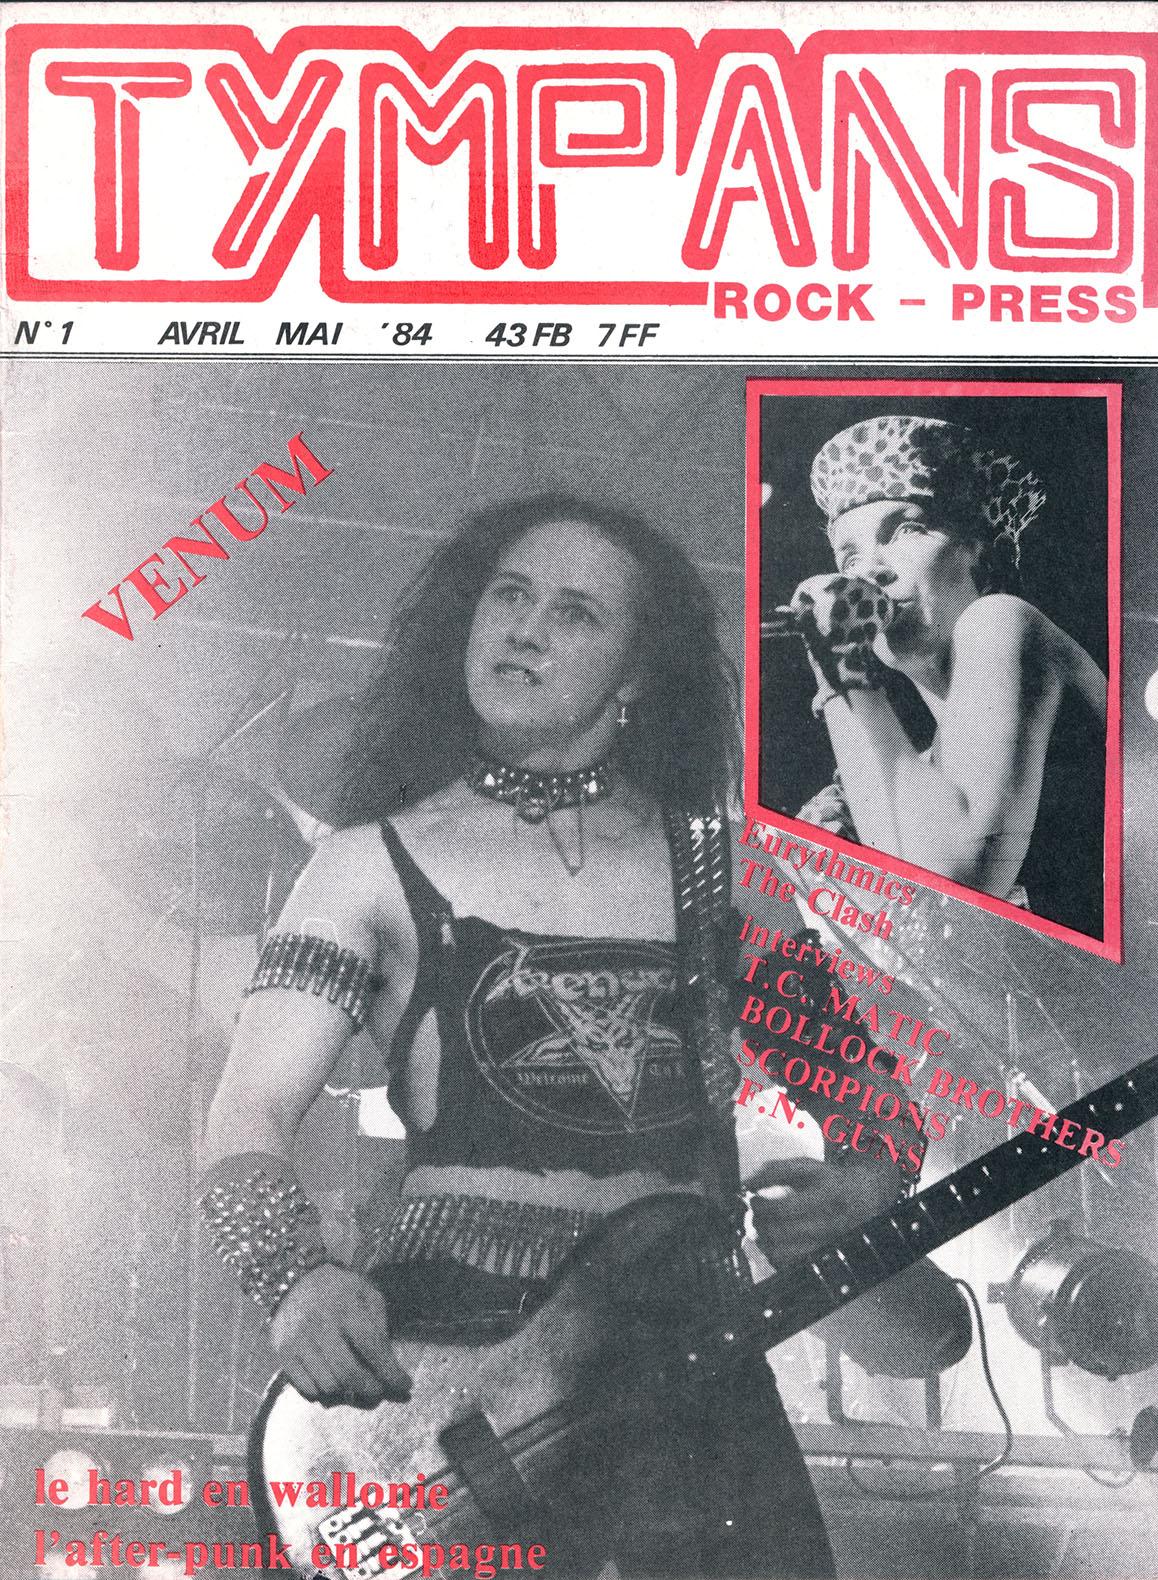 FM-GUNS interview dans le fanzine TYMPANS n°1 (1984) Archive Tympan14